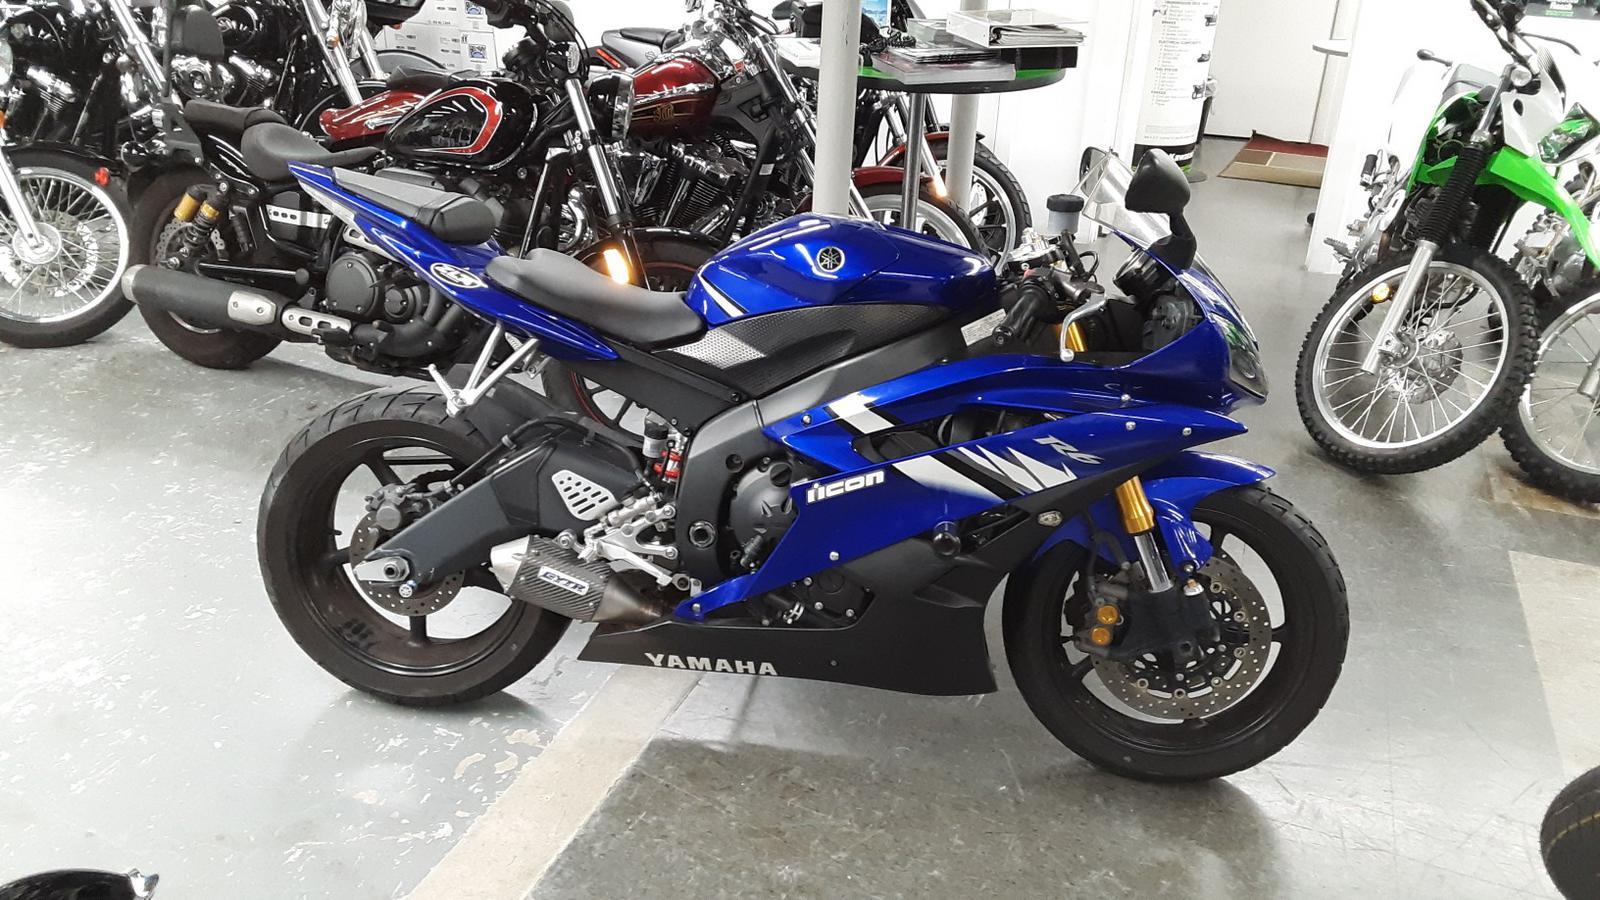 2006 Yamaha YZF-R6 for sale 227704